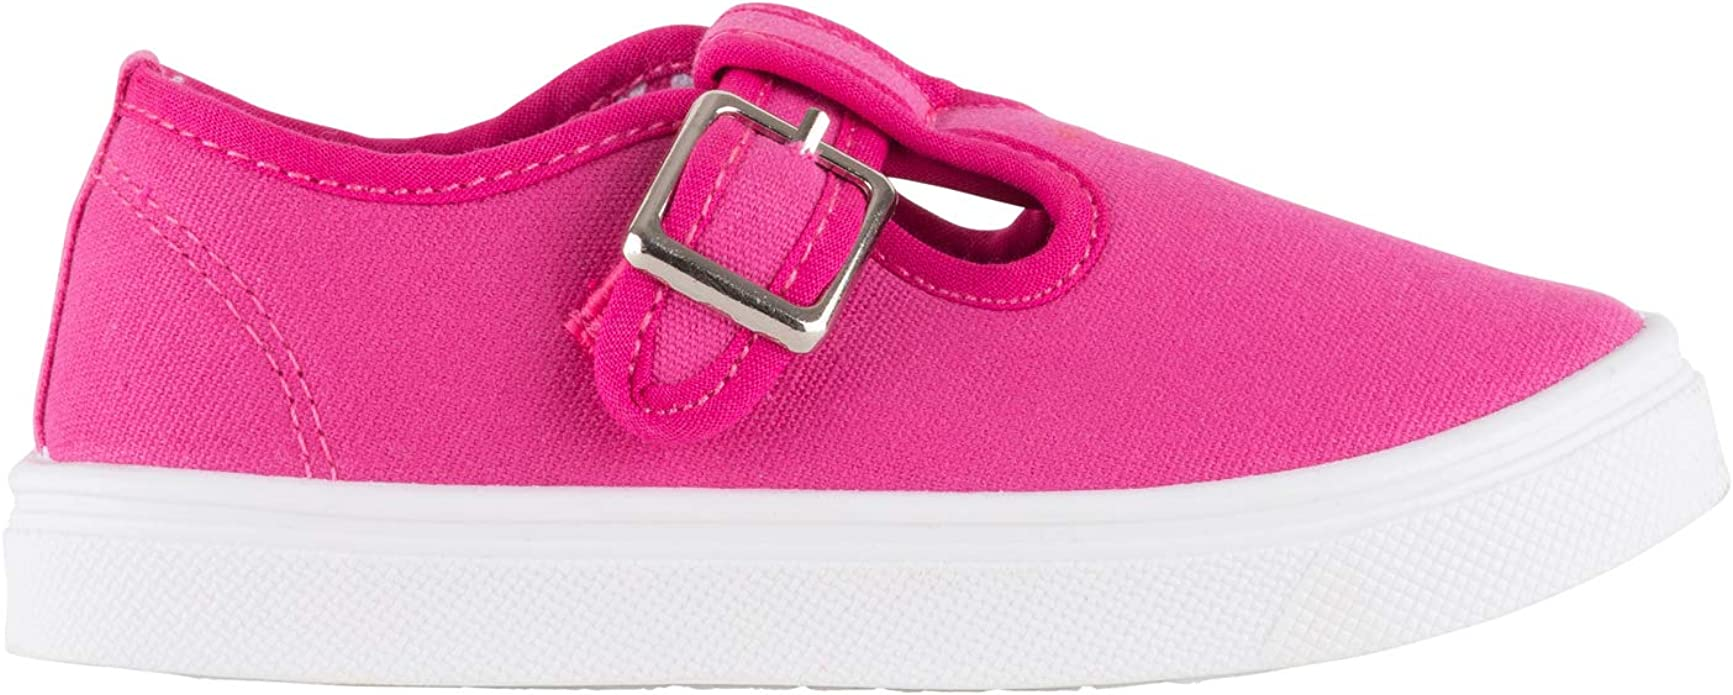 Amazon.com | Olivia Girls T -Strap Slip